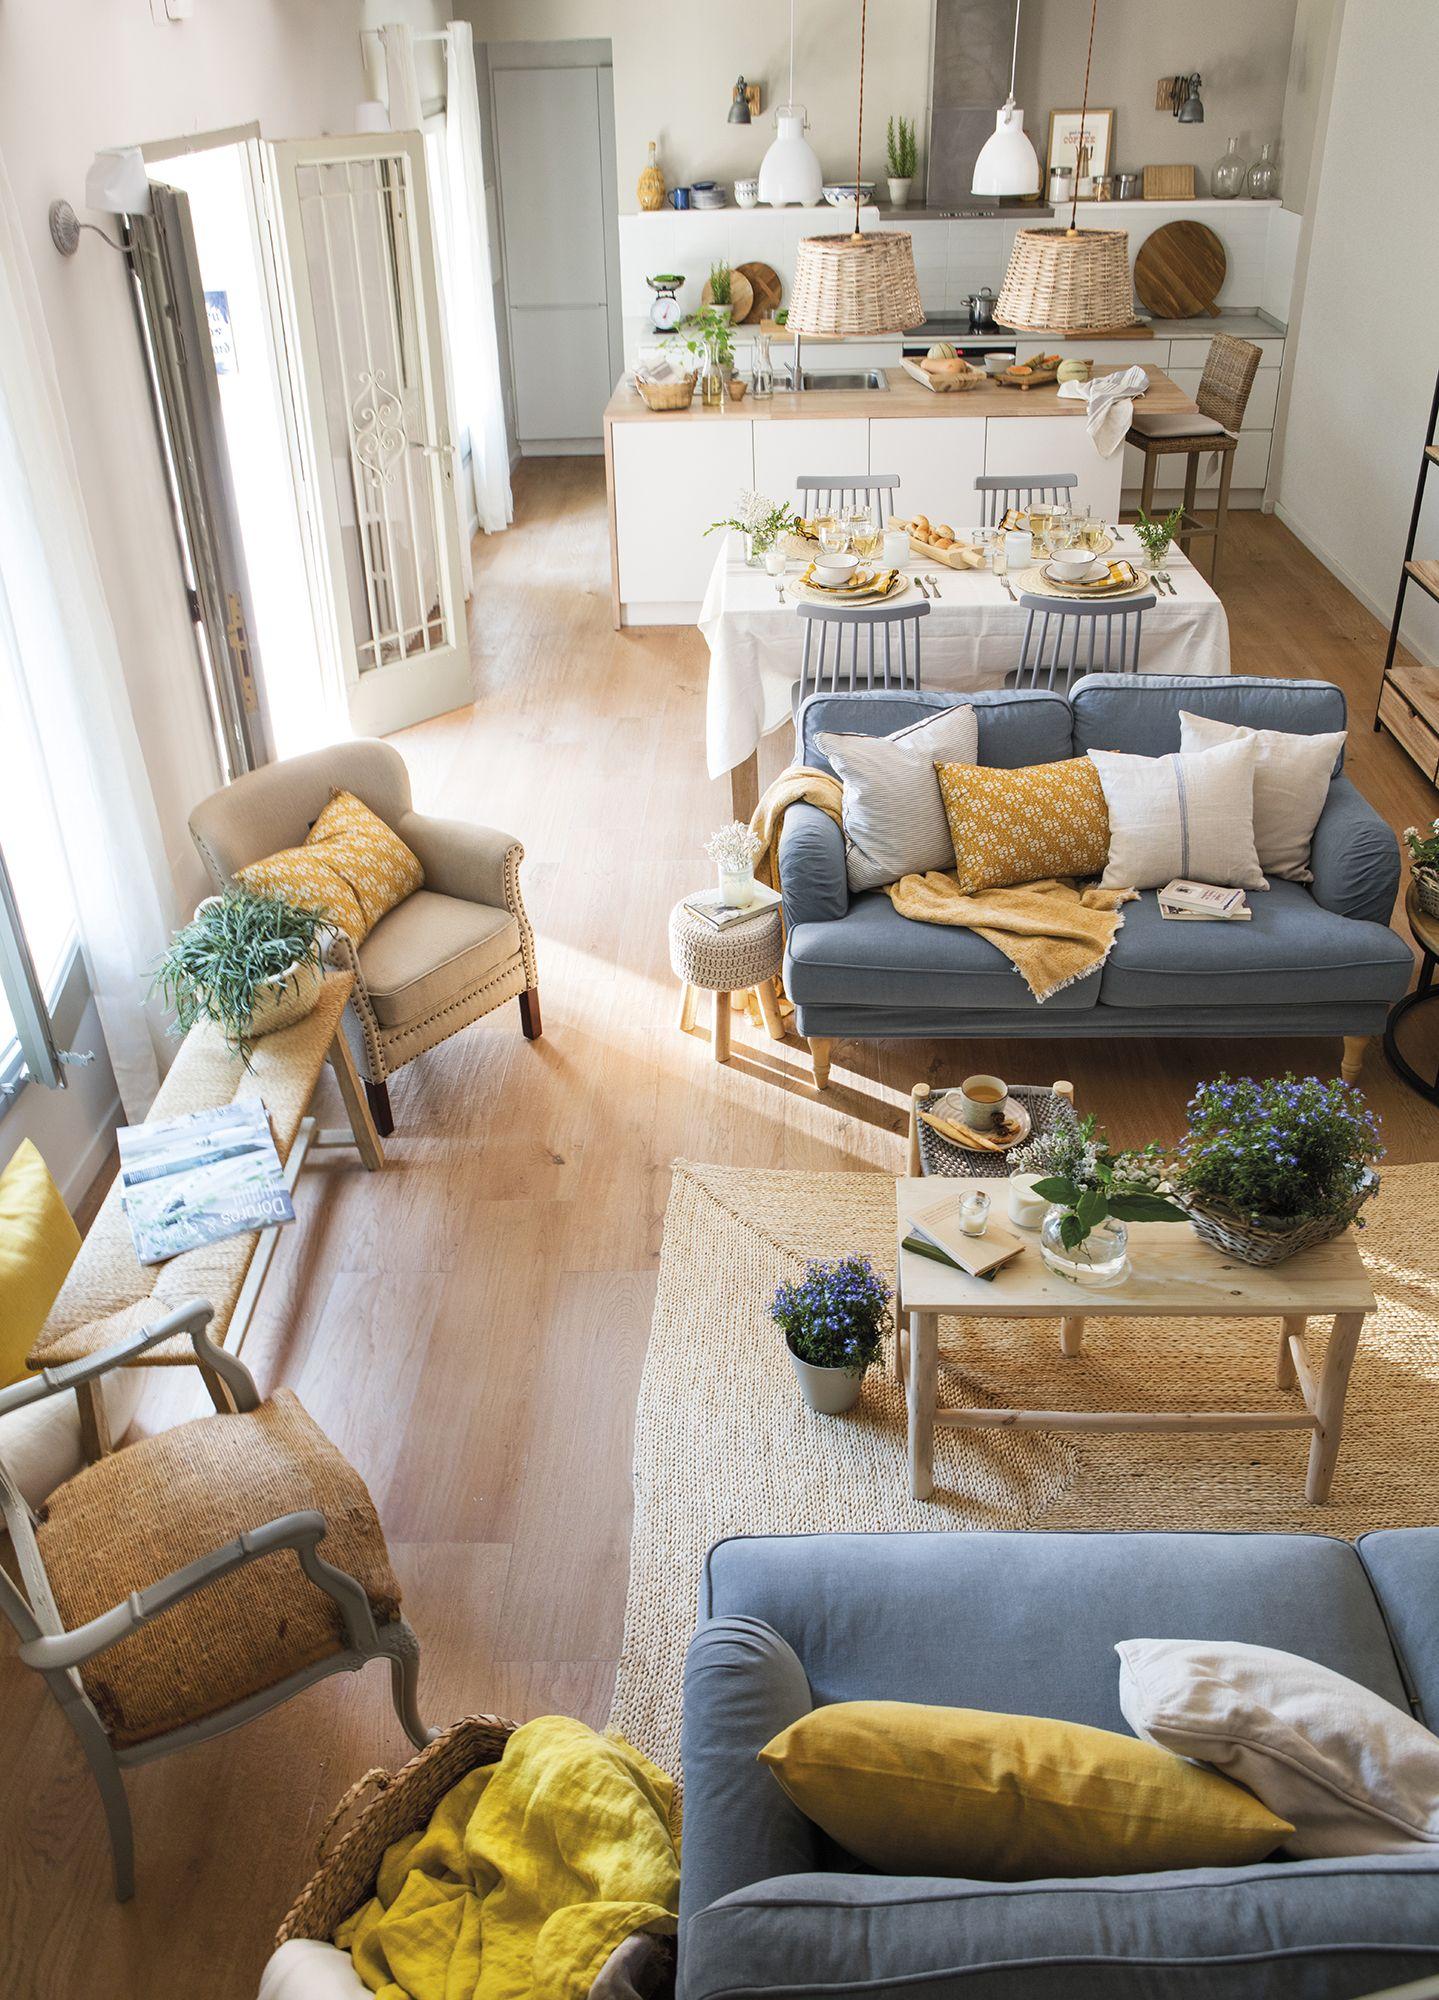 Pano260 262 Desde Arriba Inspiring Interiors Pinterest  # Muebles Modernos Diga Center